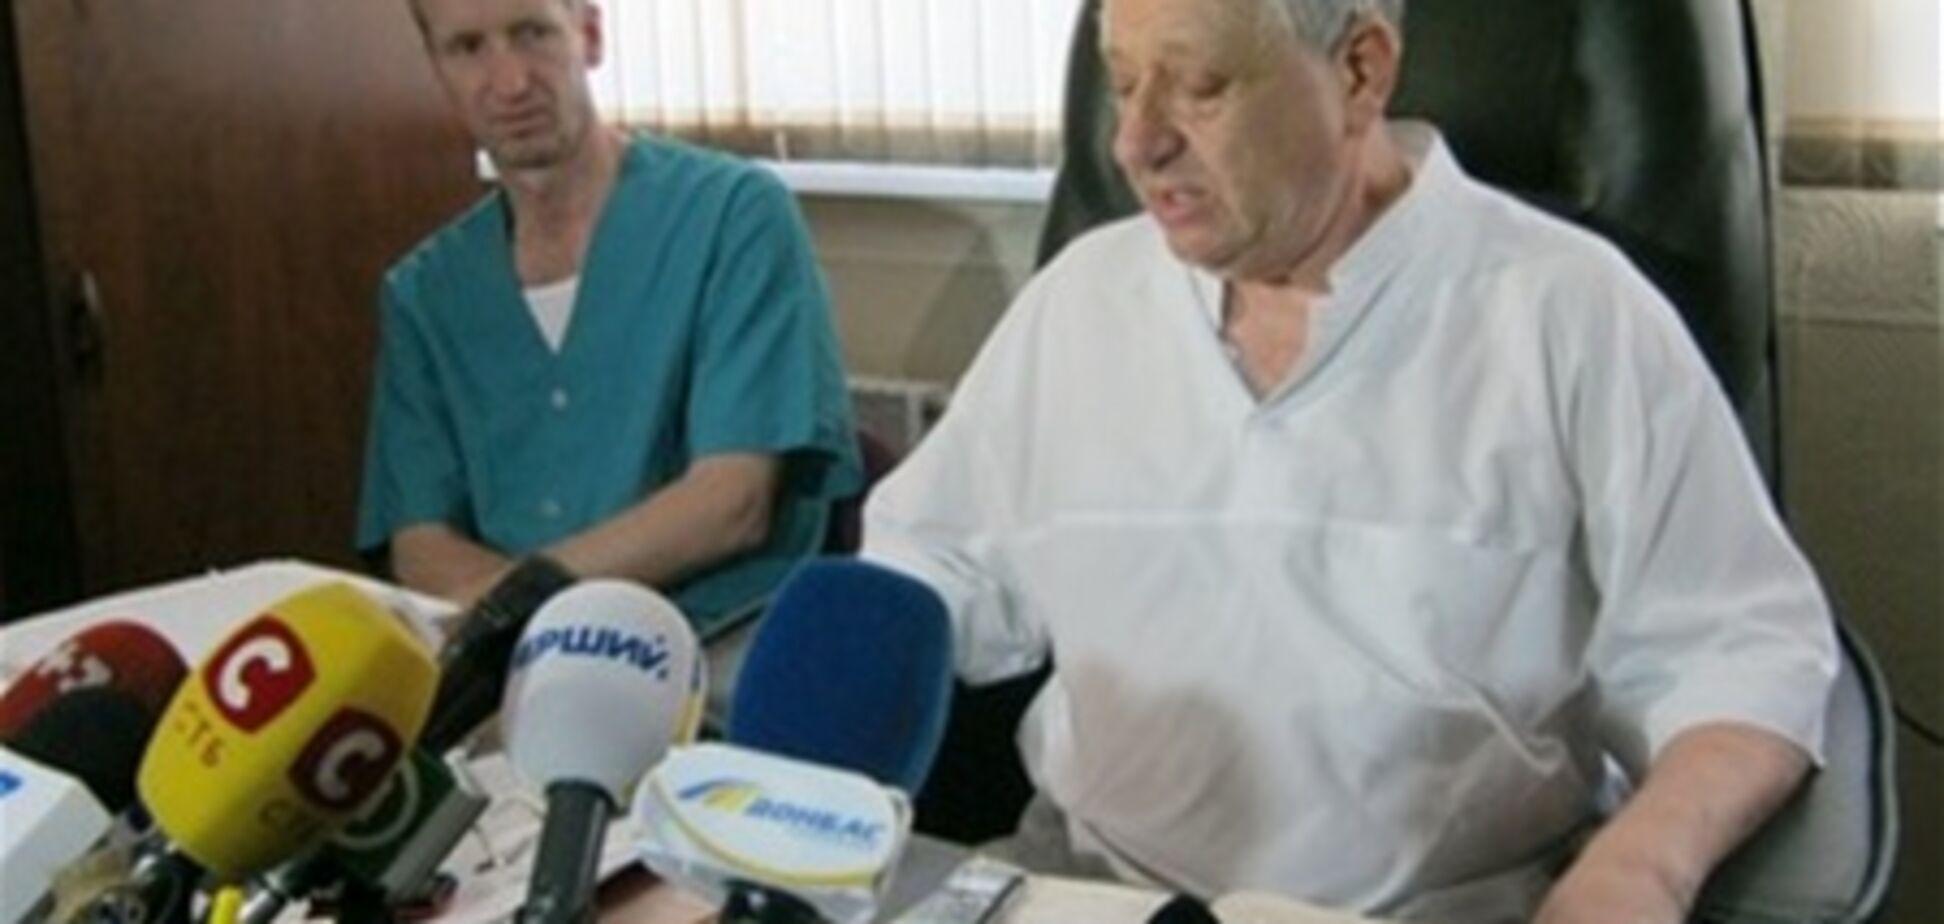 Оксана Макар уверенно идет на поправку - доктор